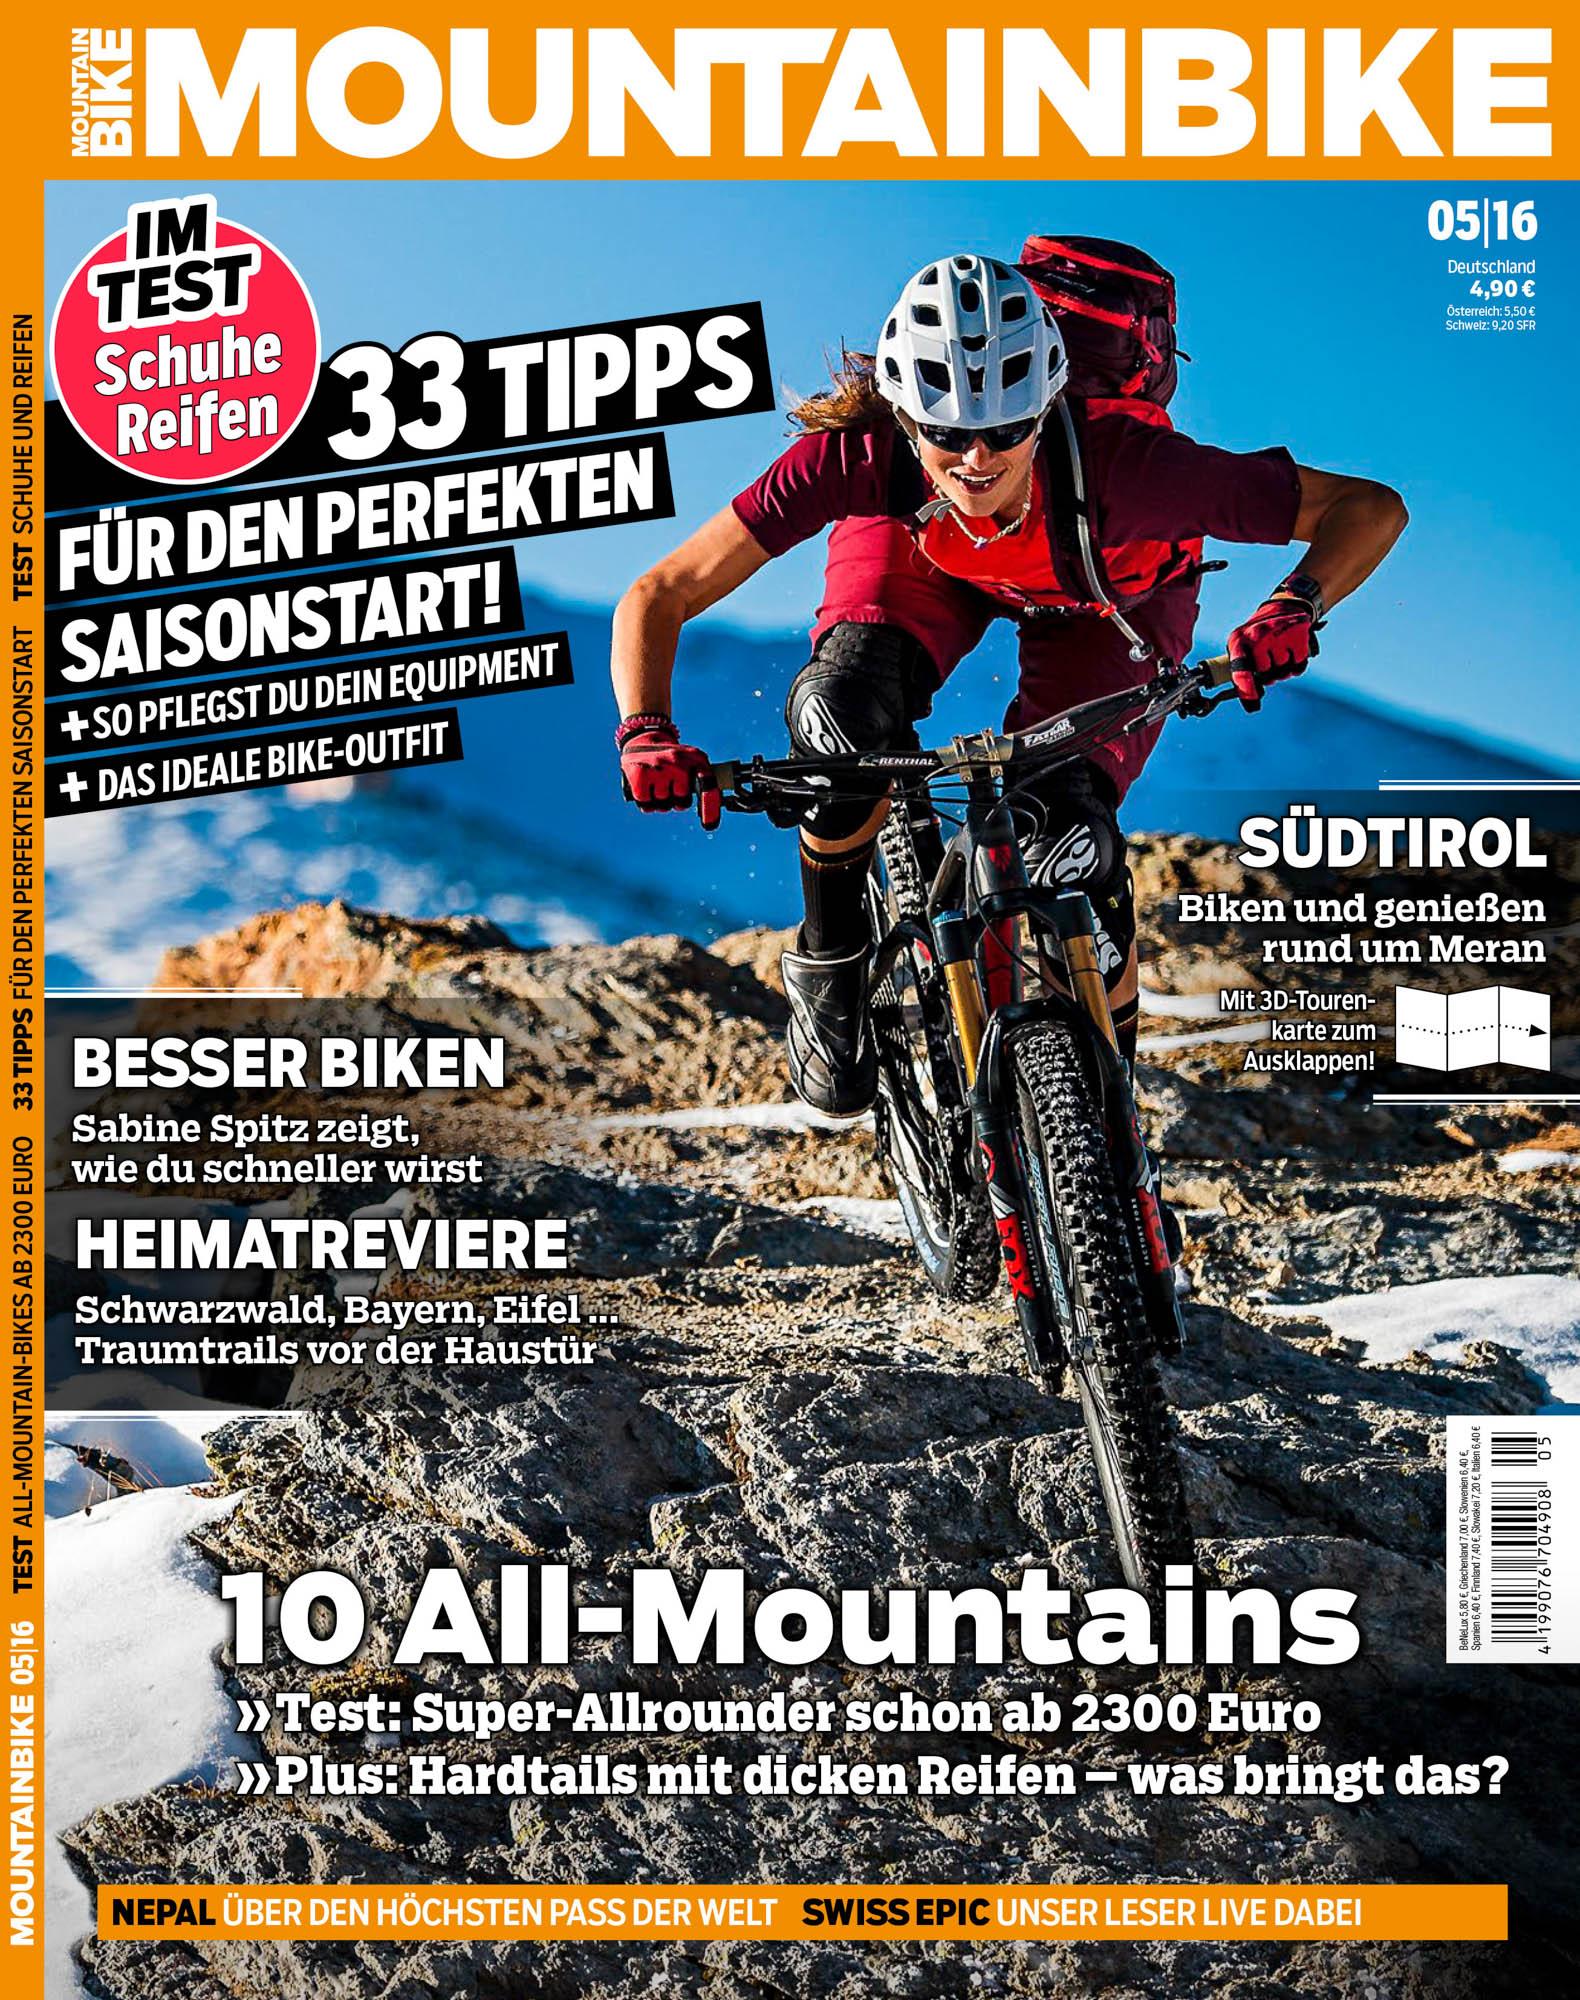 MOUNTAINBIKE-Titelbild, Ausgabe 5/2016